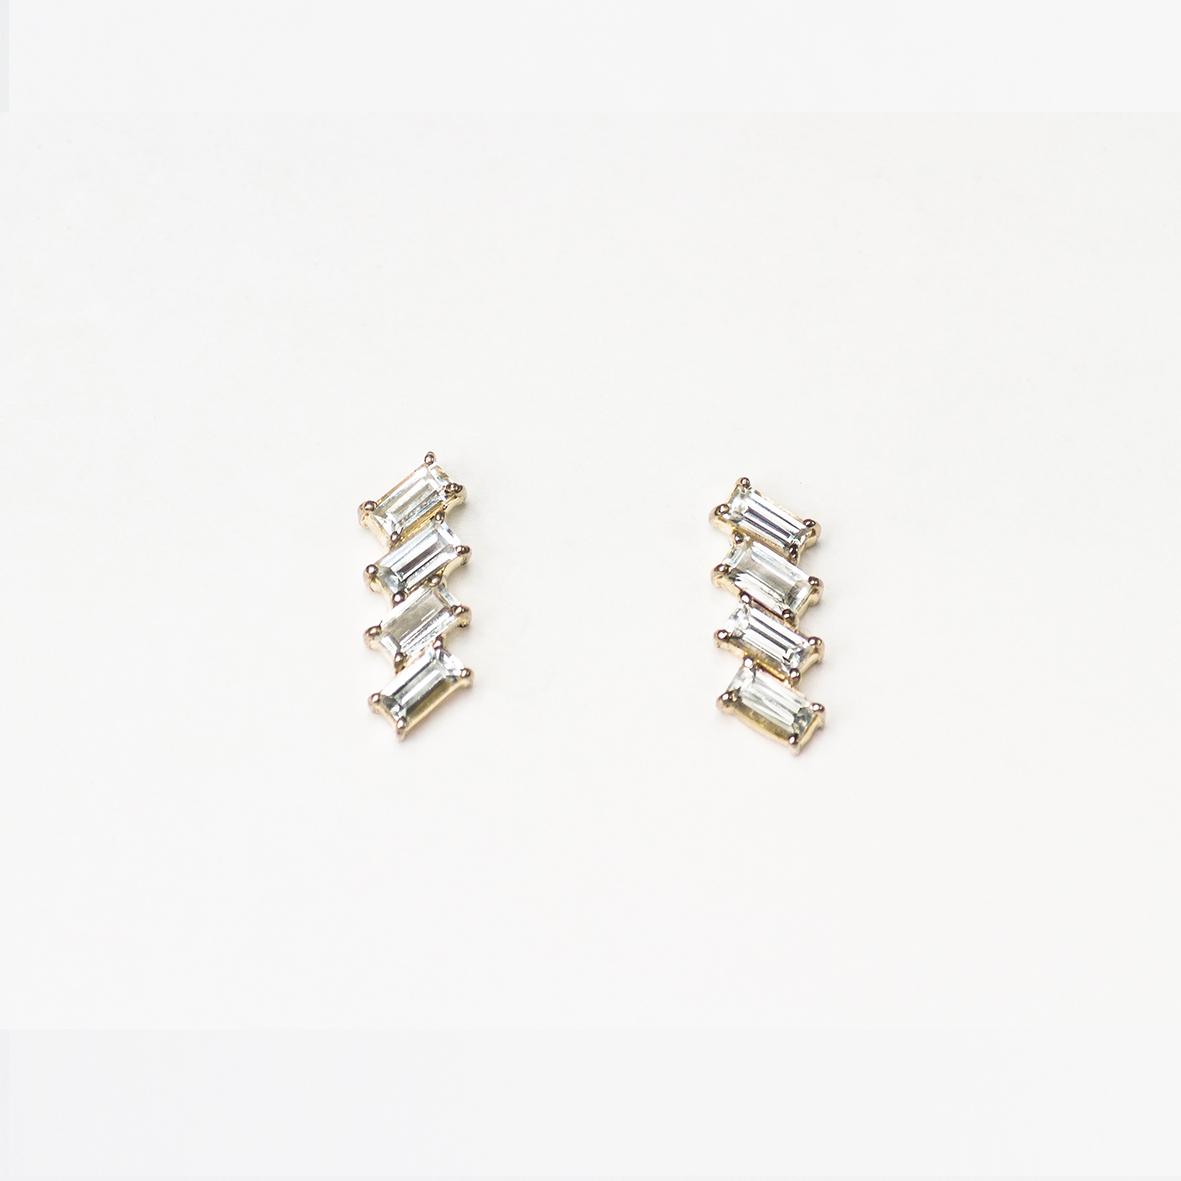 9. OONA_philo_ficha1_deco white sapphire earrings